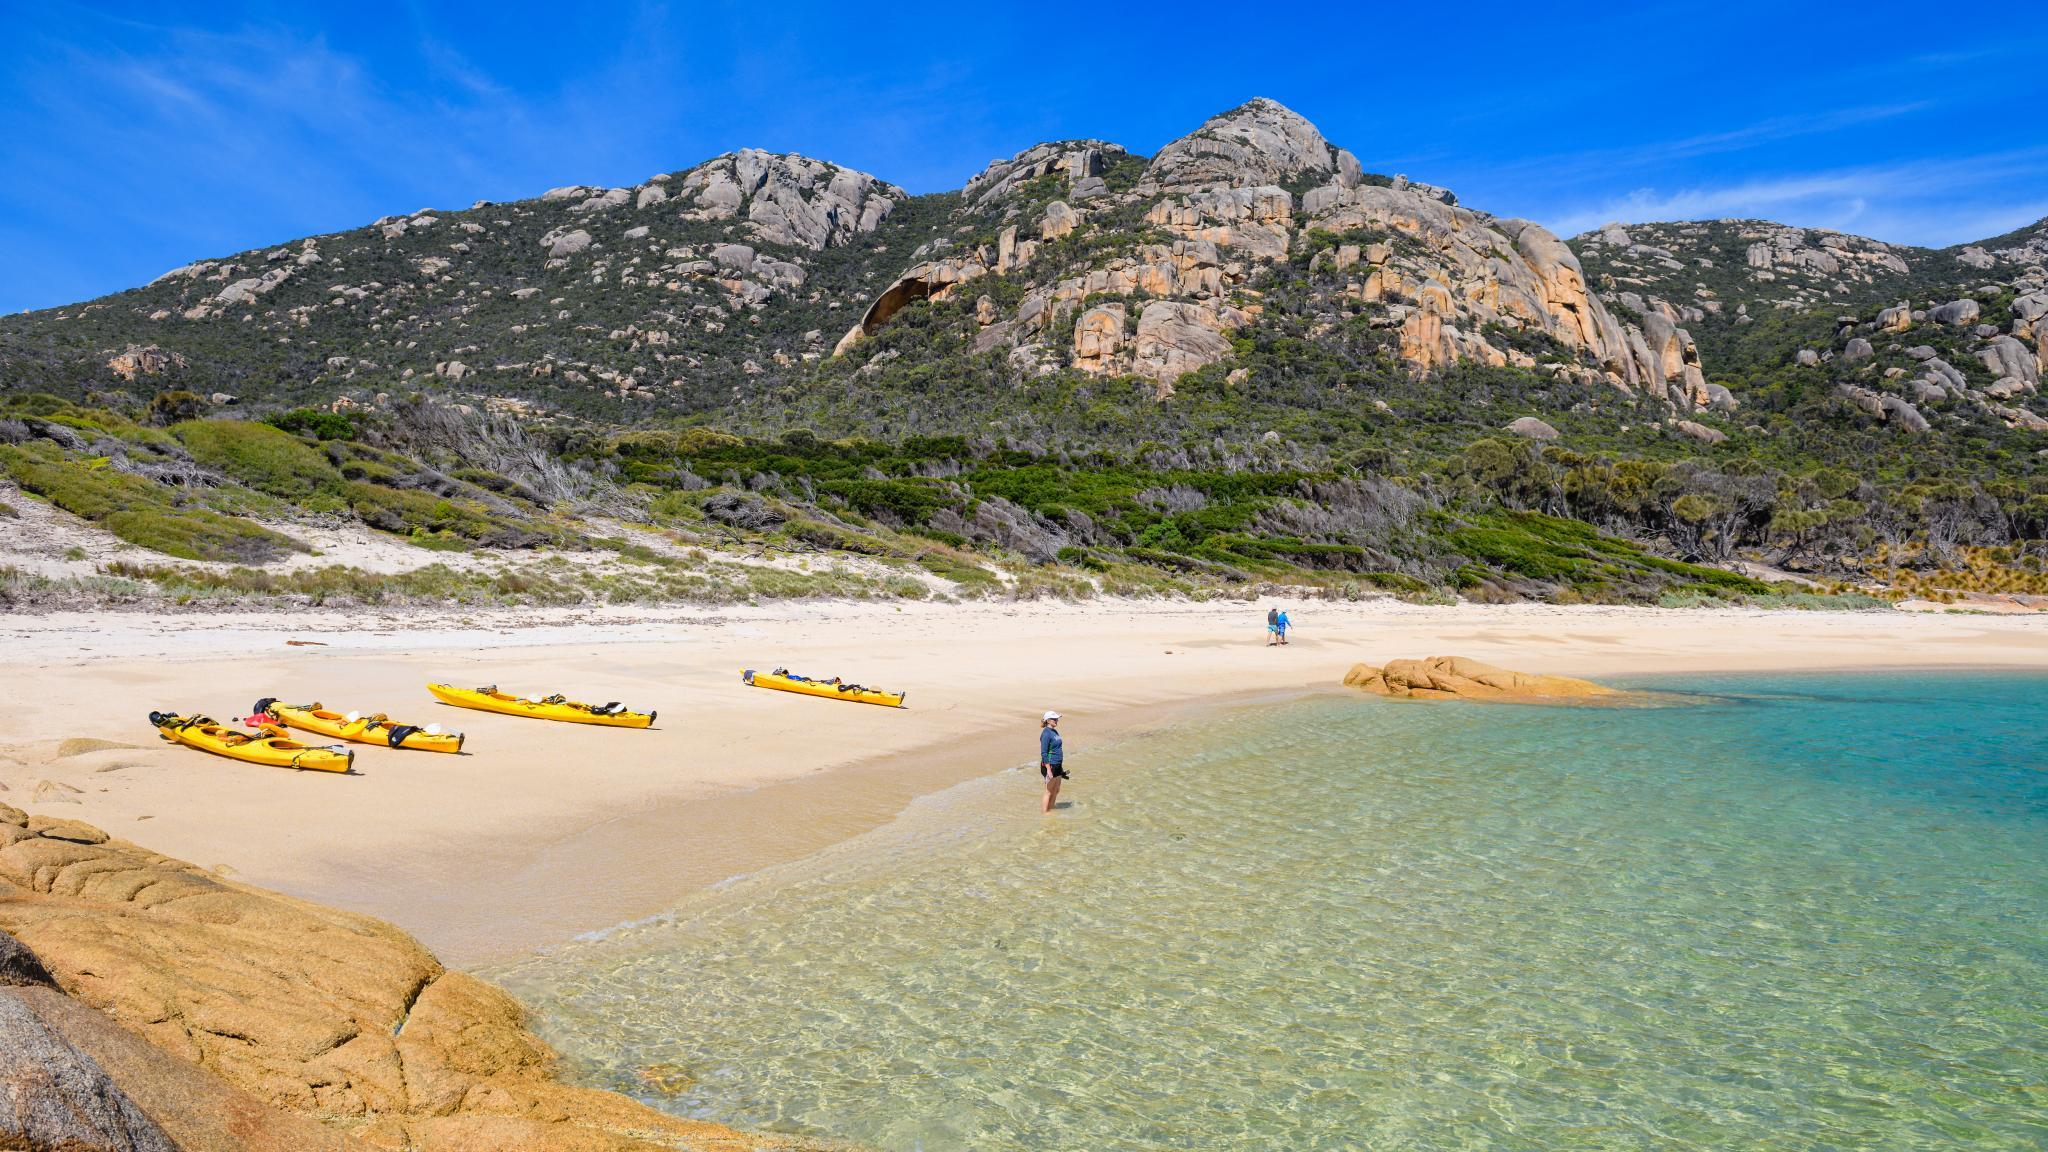 Kayaking on Flinders Island